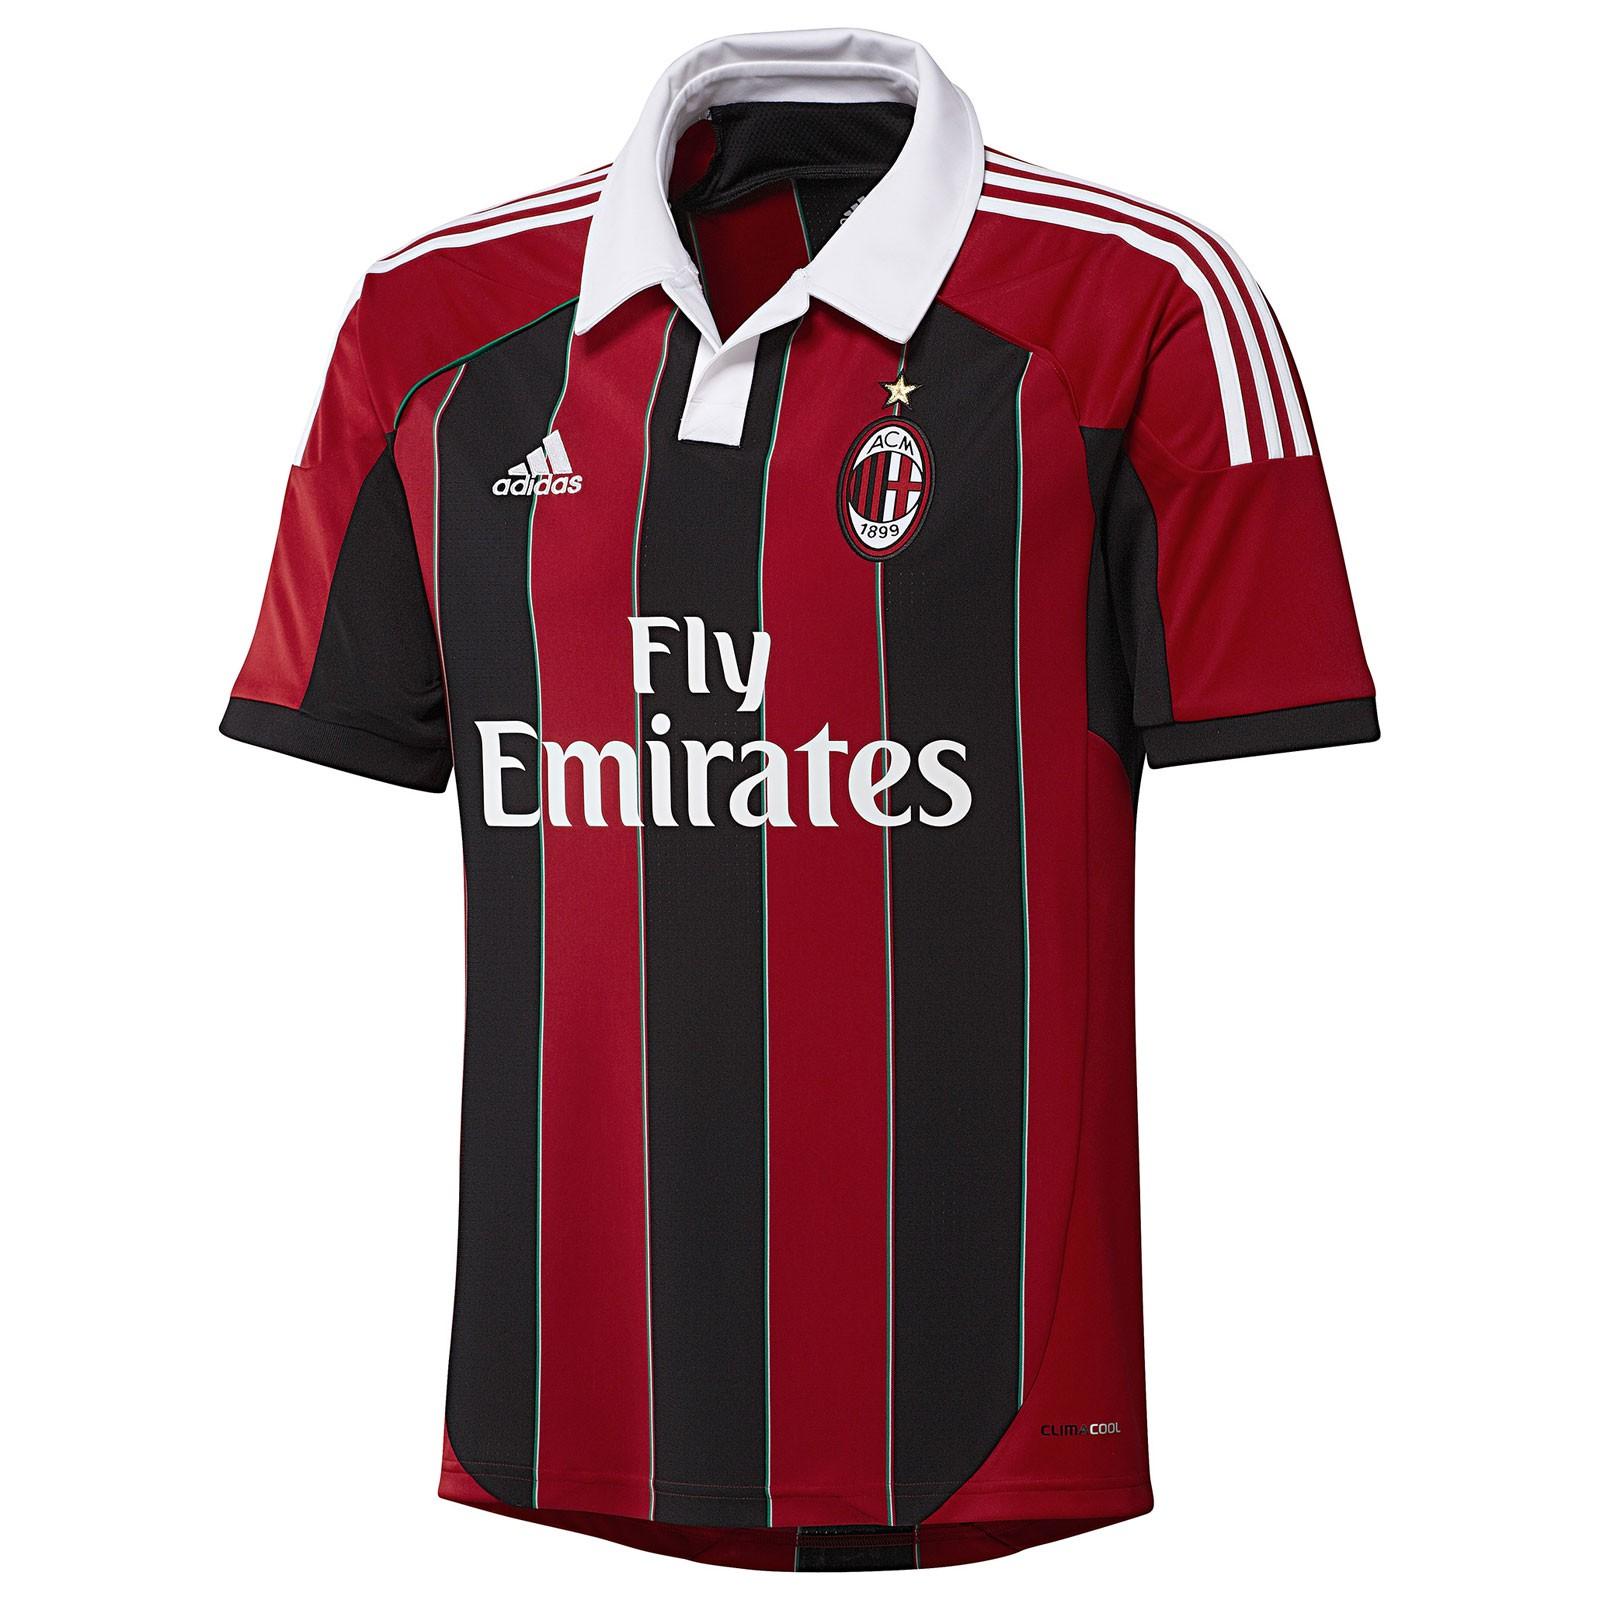 AC米兰2012/13赛季球迷版主场球衣